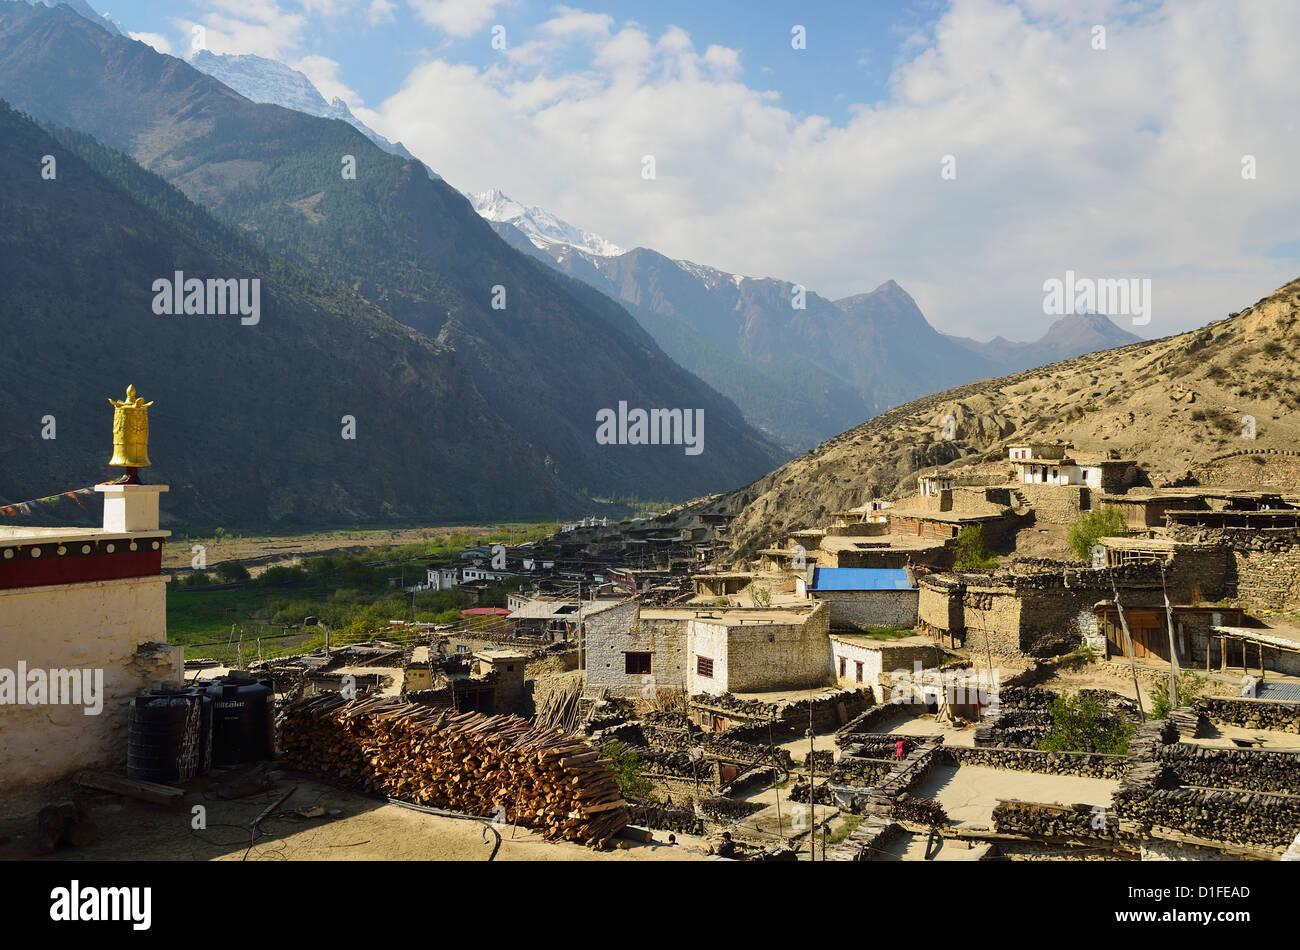 Marpha village, Annapurna Conservation Area, Mustang District, Dhawalagiri (Dhaulagiri), Western Region (Pashchimanchal), - Stock Image